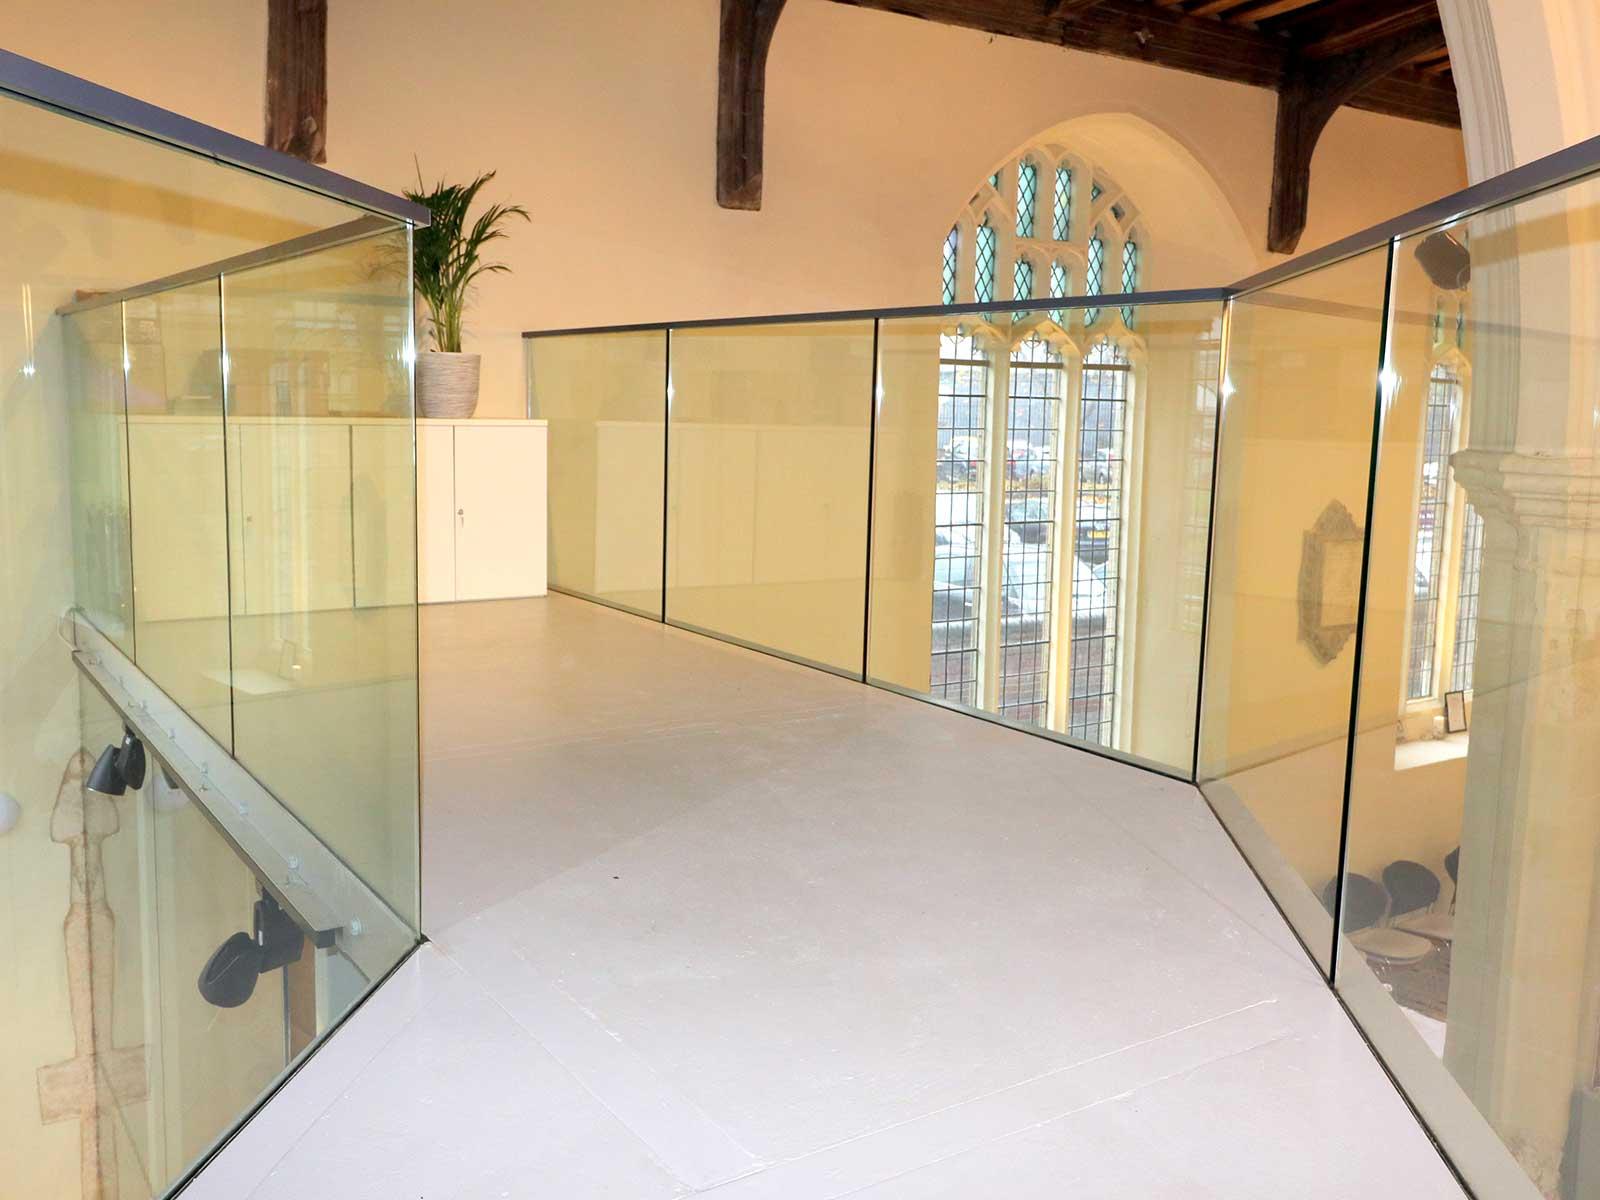 Glass Balustrades to Church Mezzanine Floor